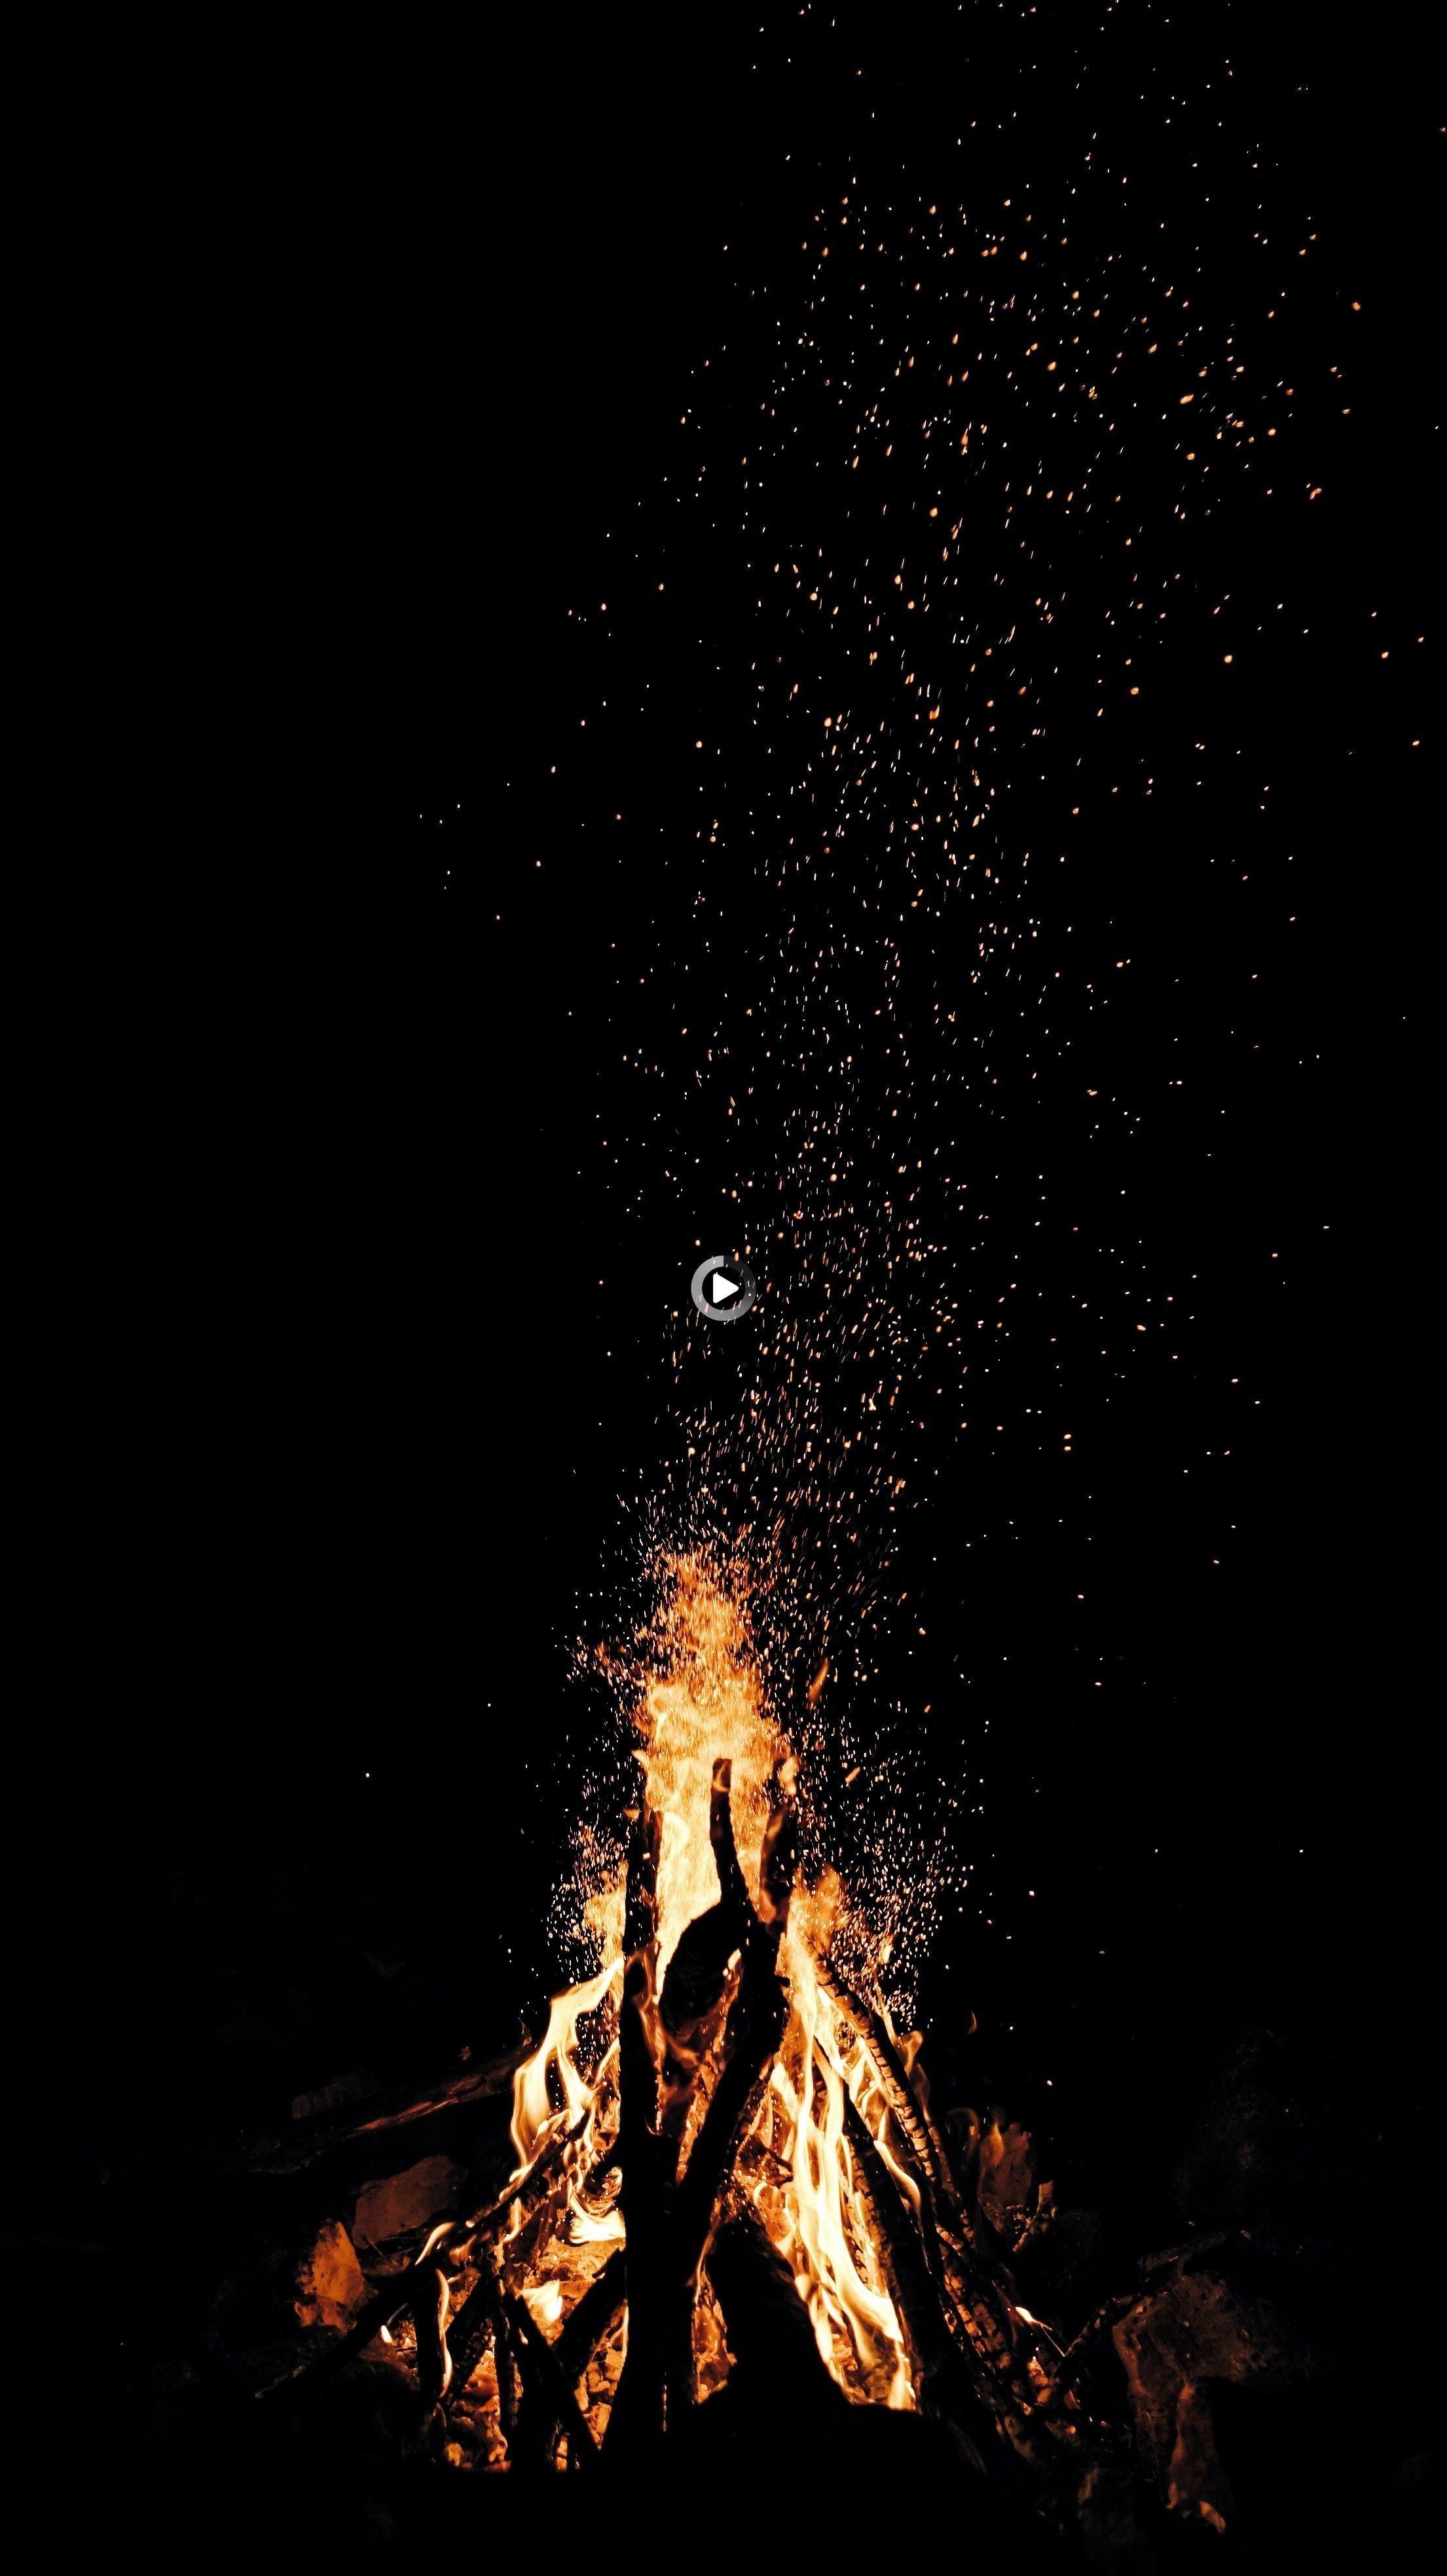 Diy Linen Culottes The Essentials Club Creative Diy Hub In 2021 Fire Photography Zen Wall Art Black Wallpaper